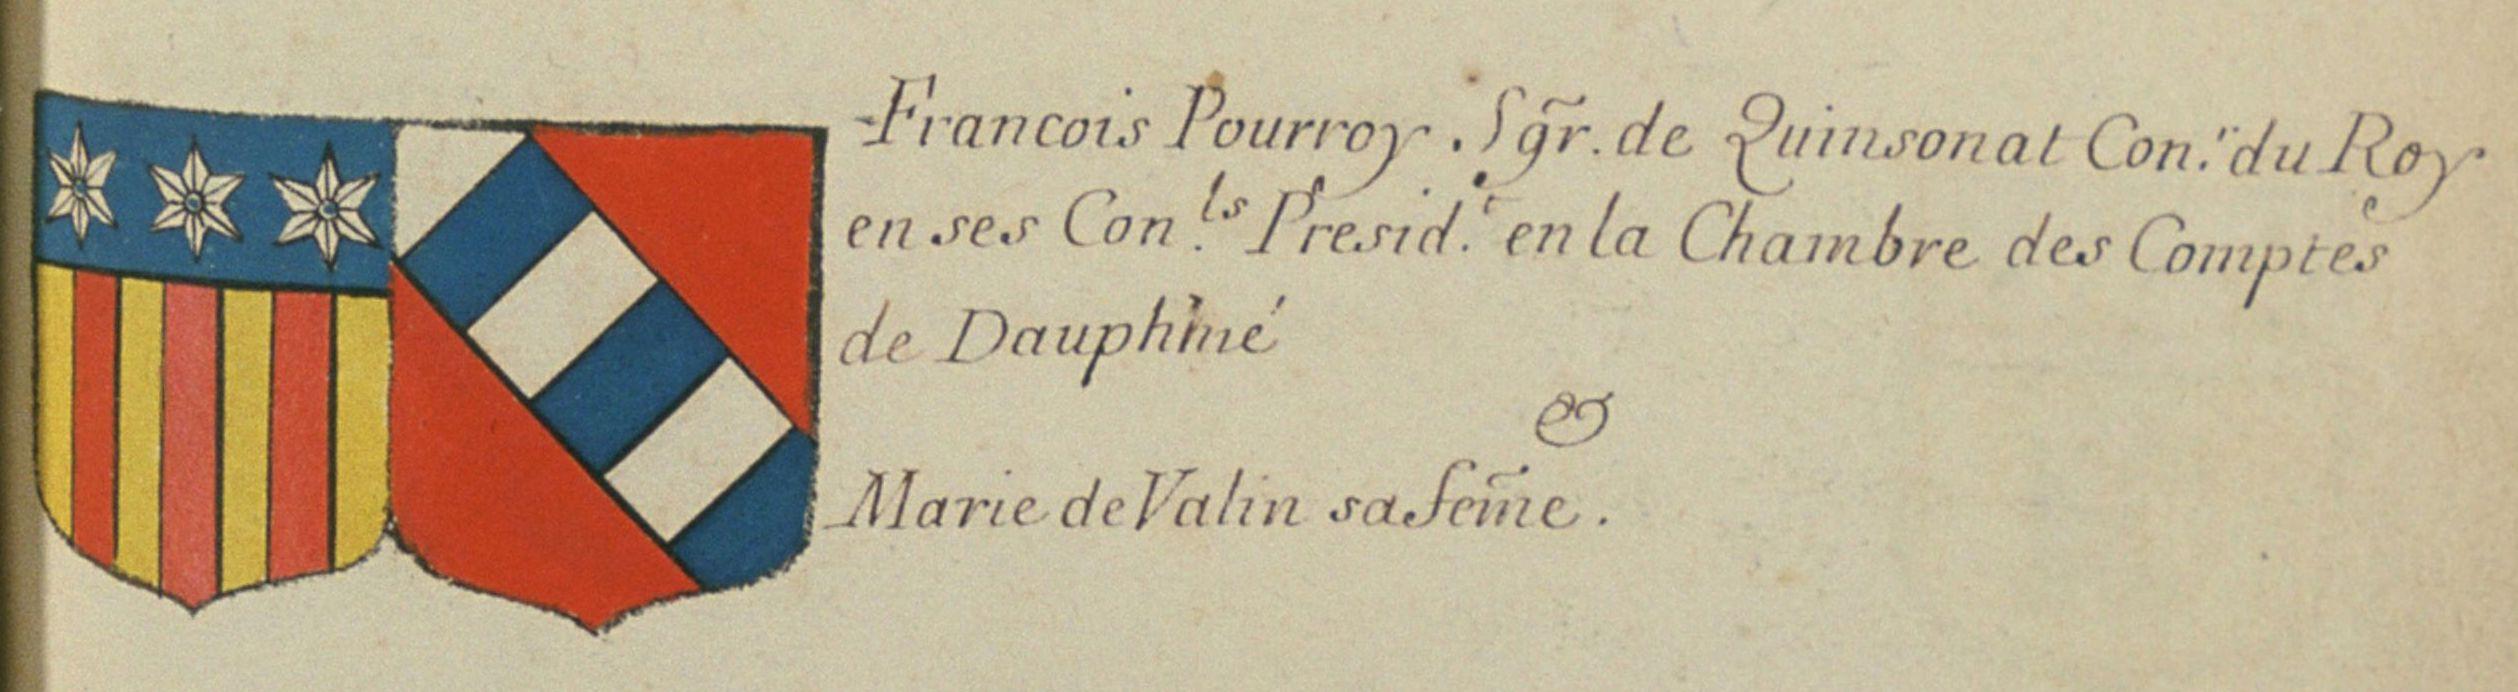 blason Pourroy de Quinsonnas-1